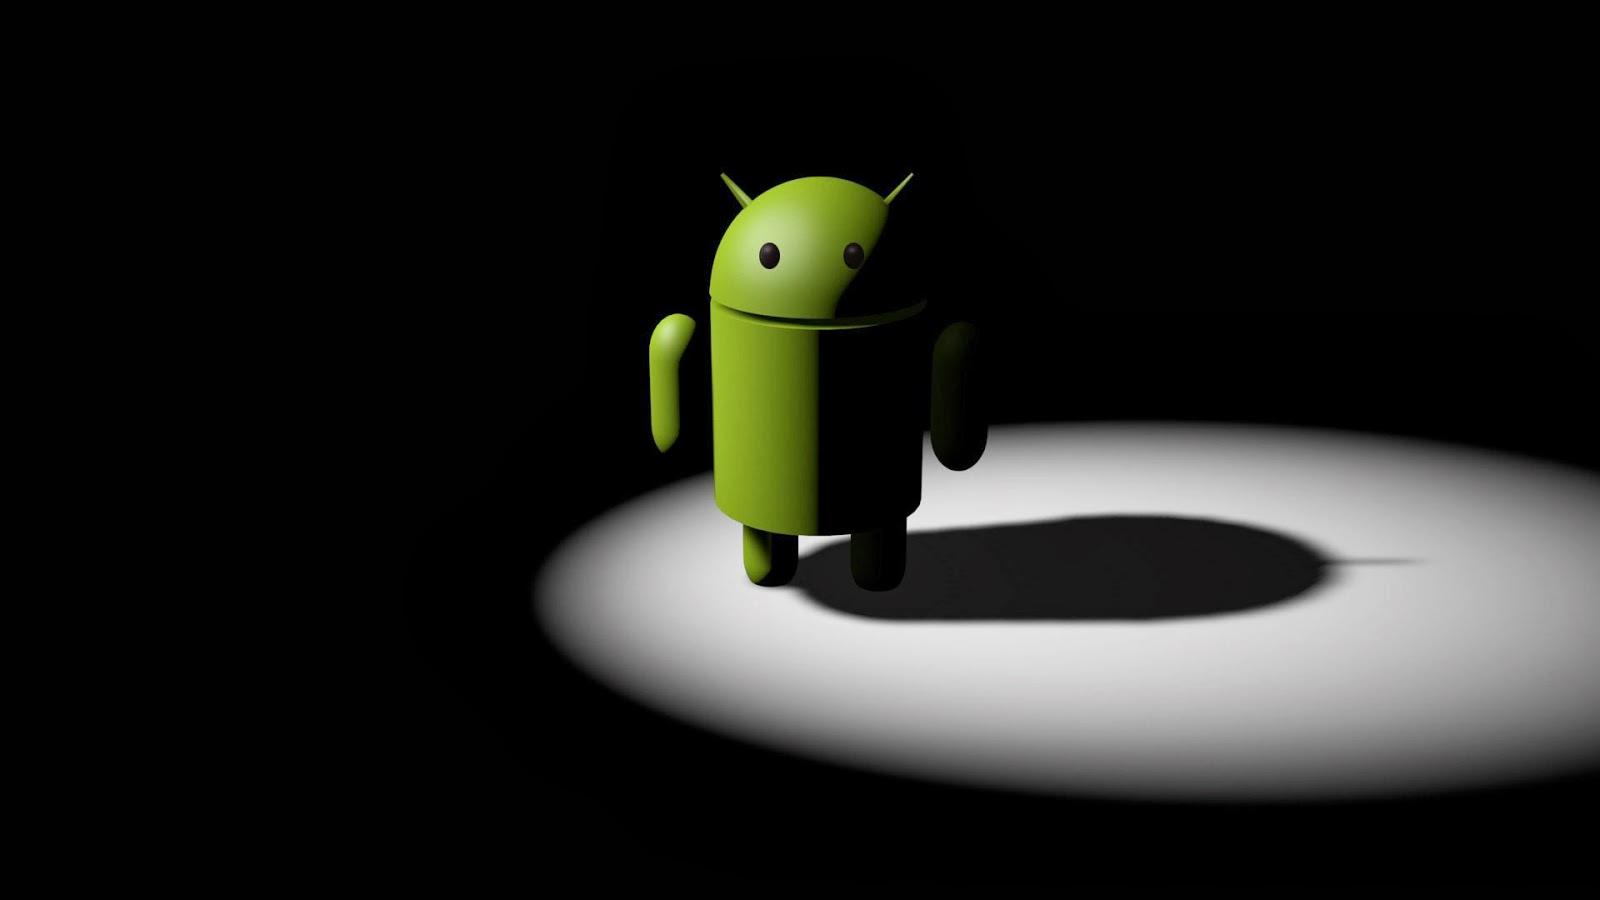 Mi Samsung Galaxy S3: Fondos De Pantalla Android (para PC